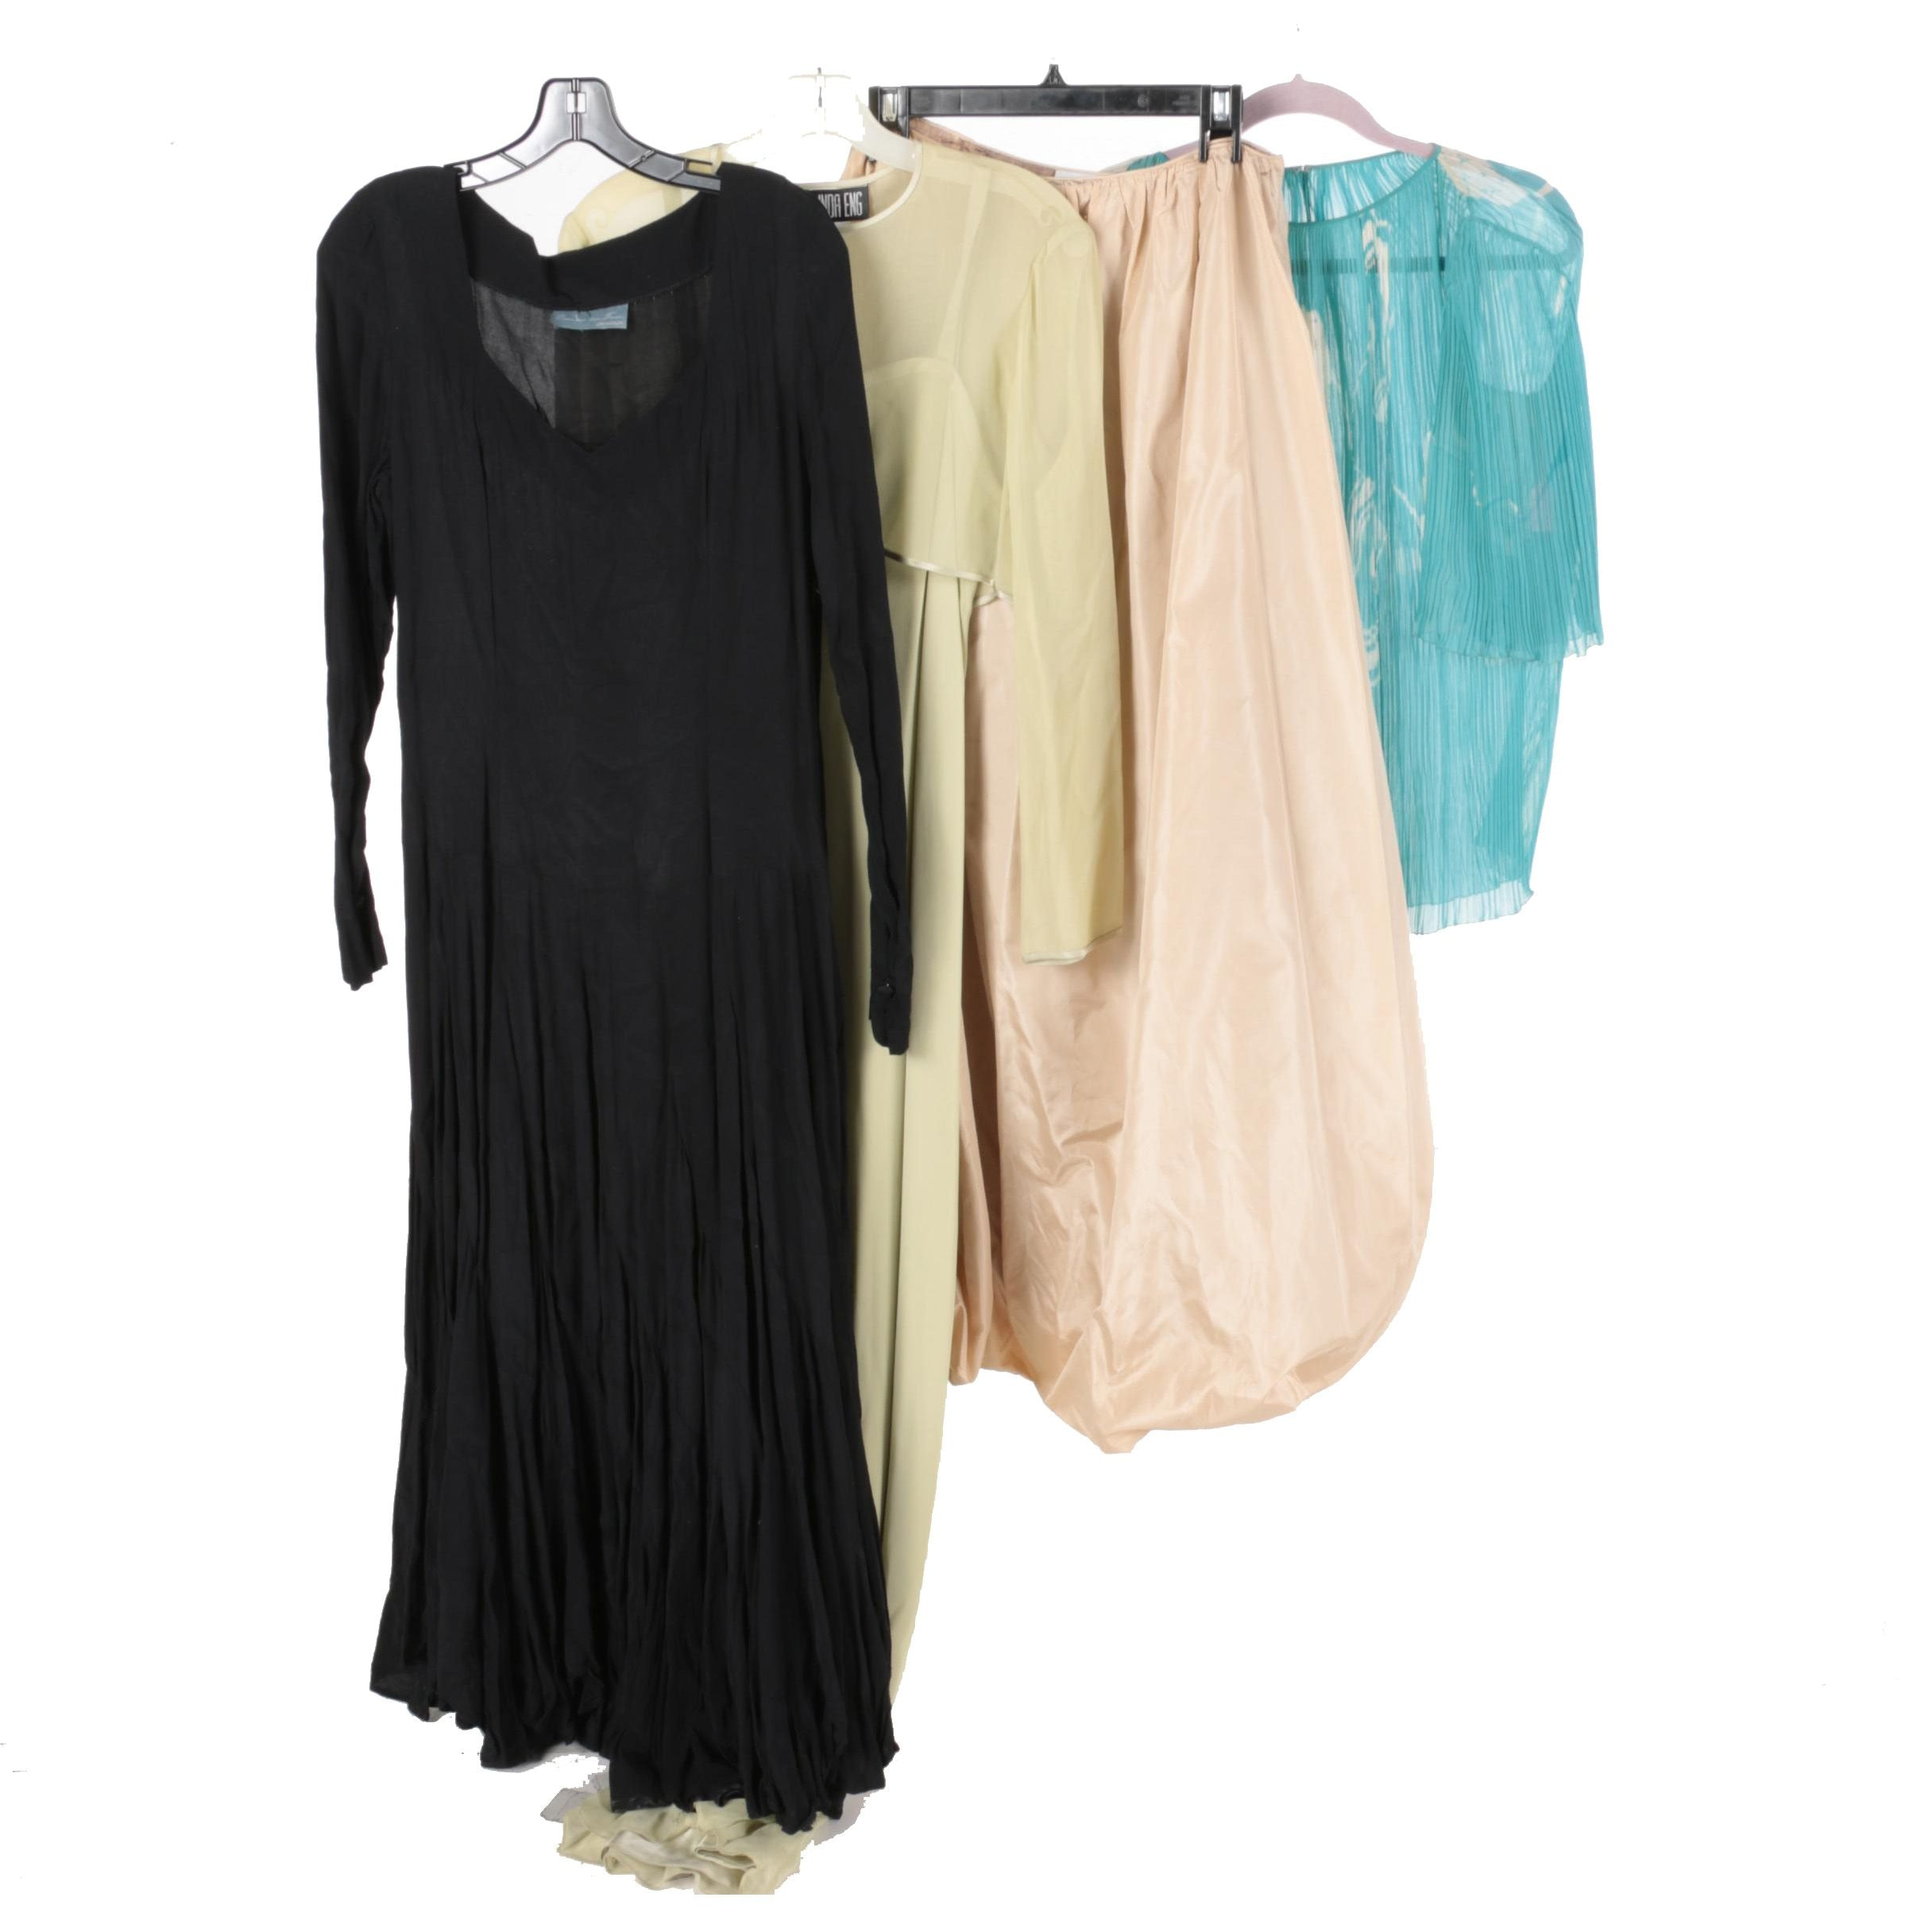 Women's Evening Wear Including Melinda Eng